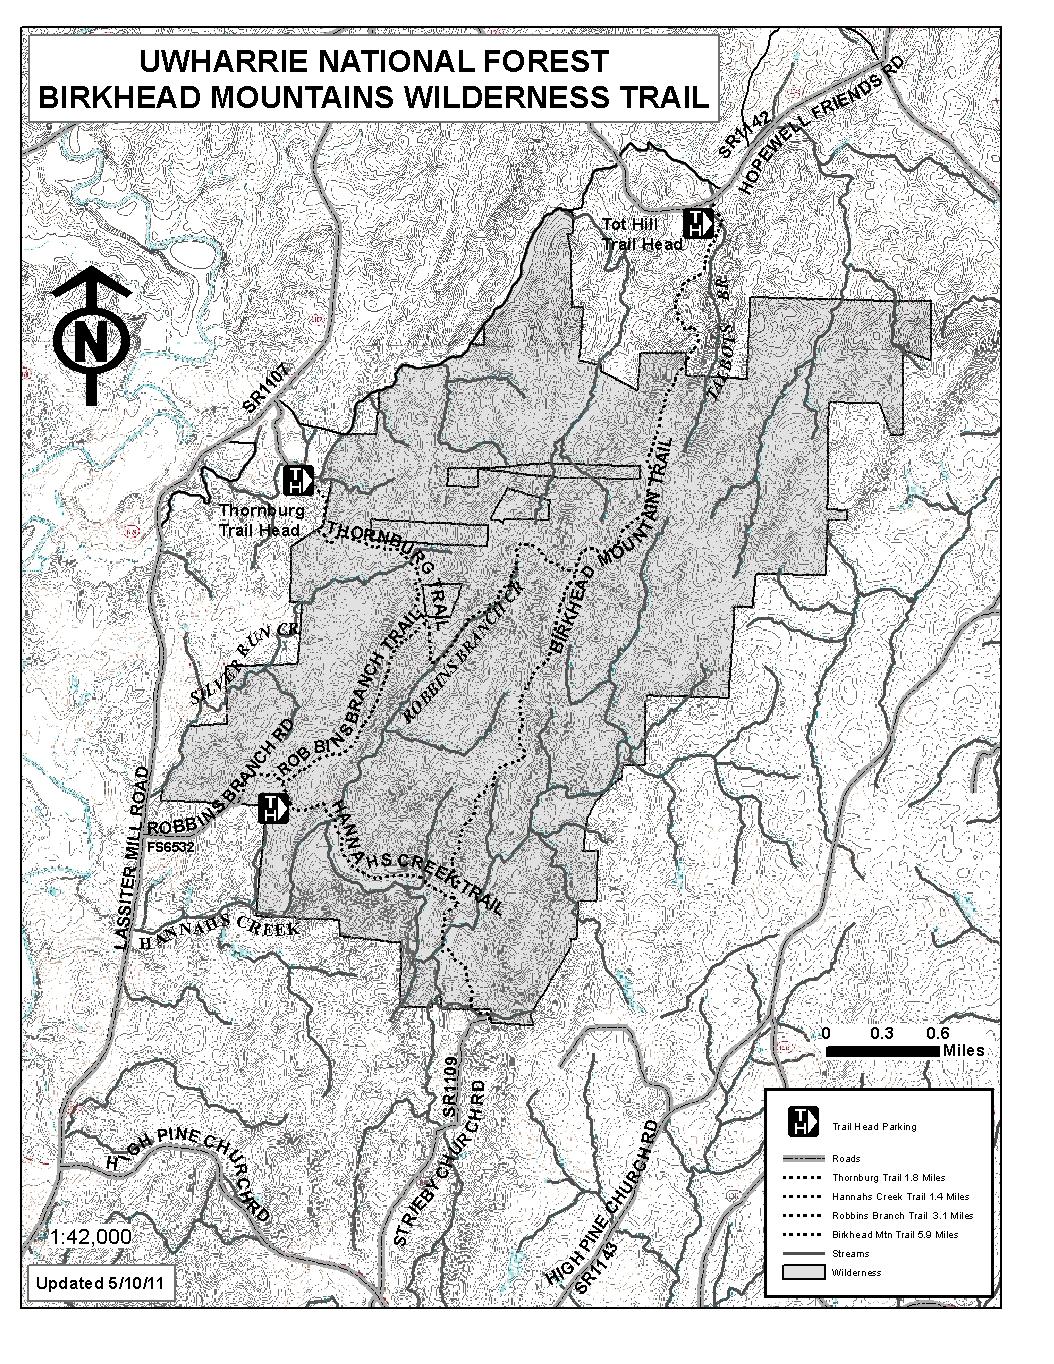 Birkhead Mountains Wilderness - Wikipedia